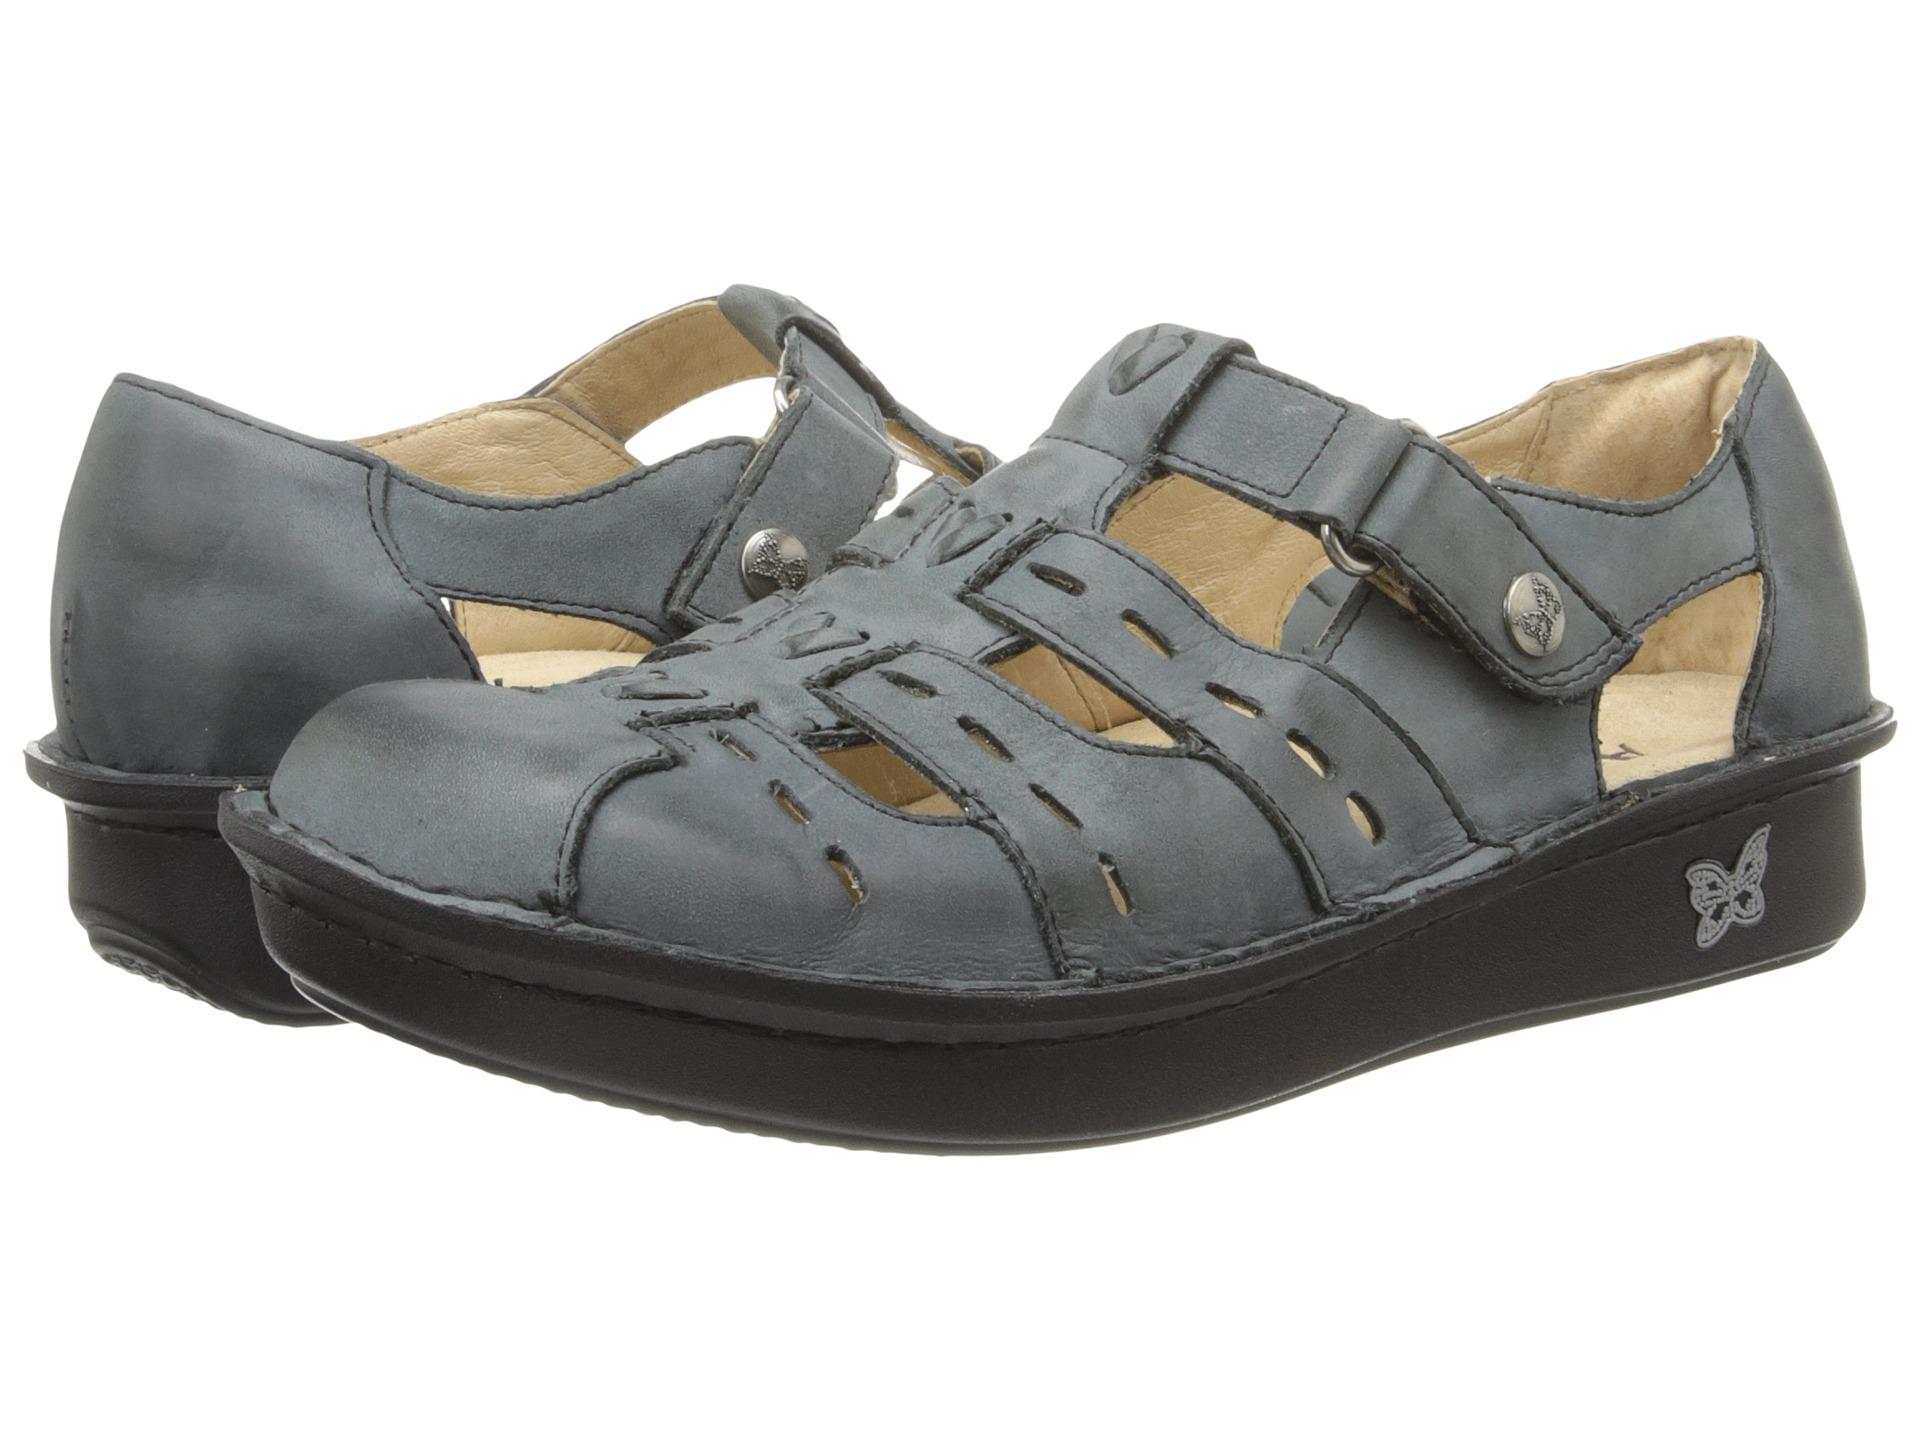 Zappos stylish comfort shoes